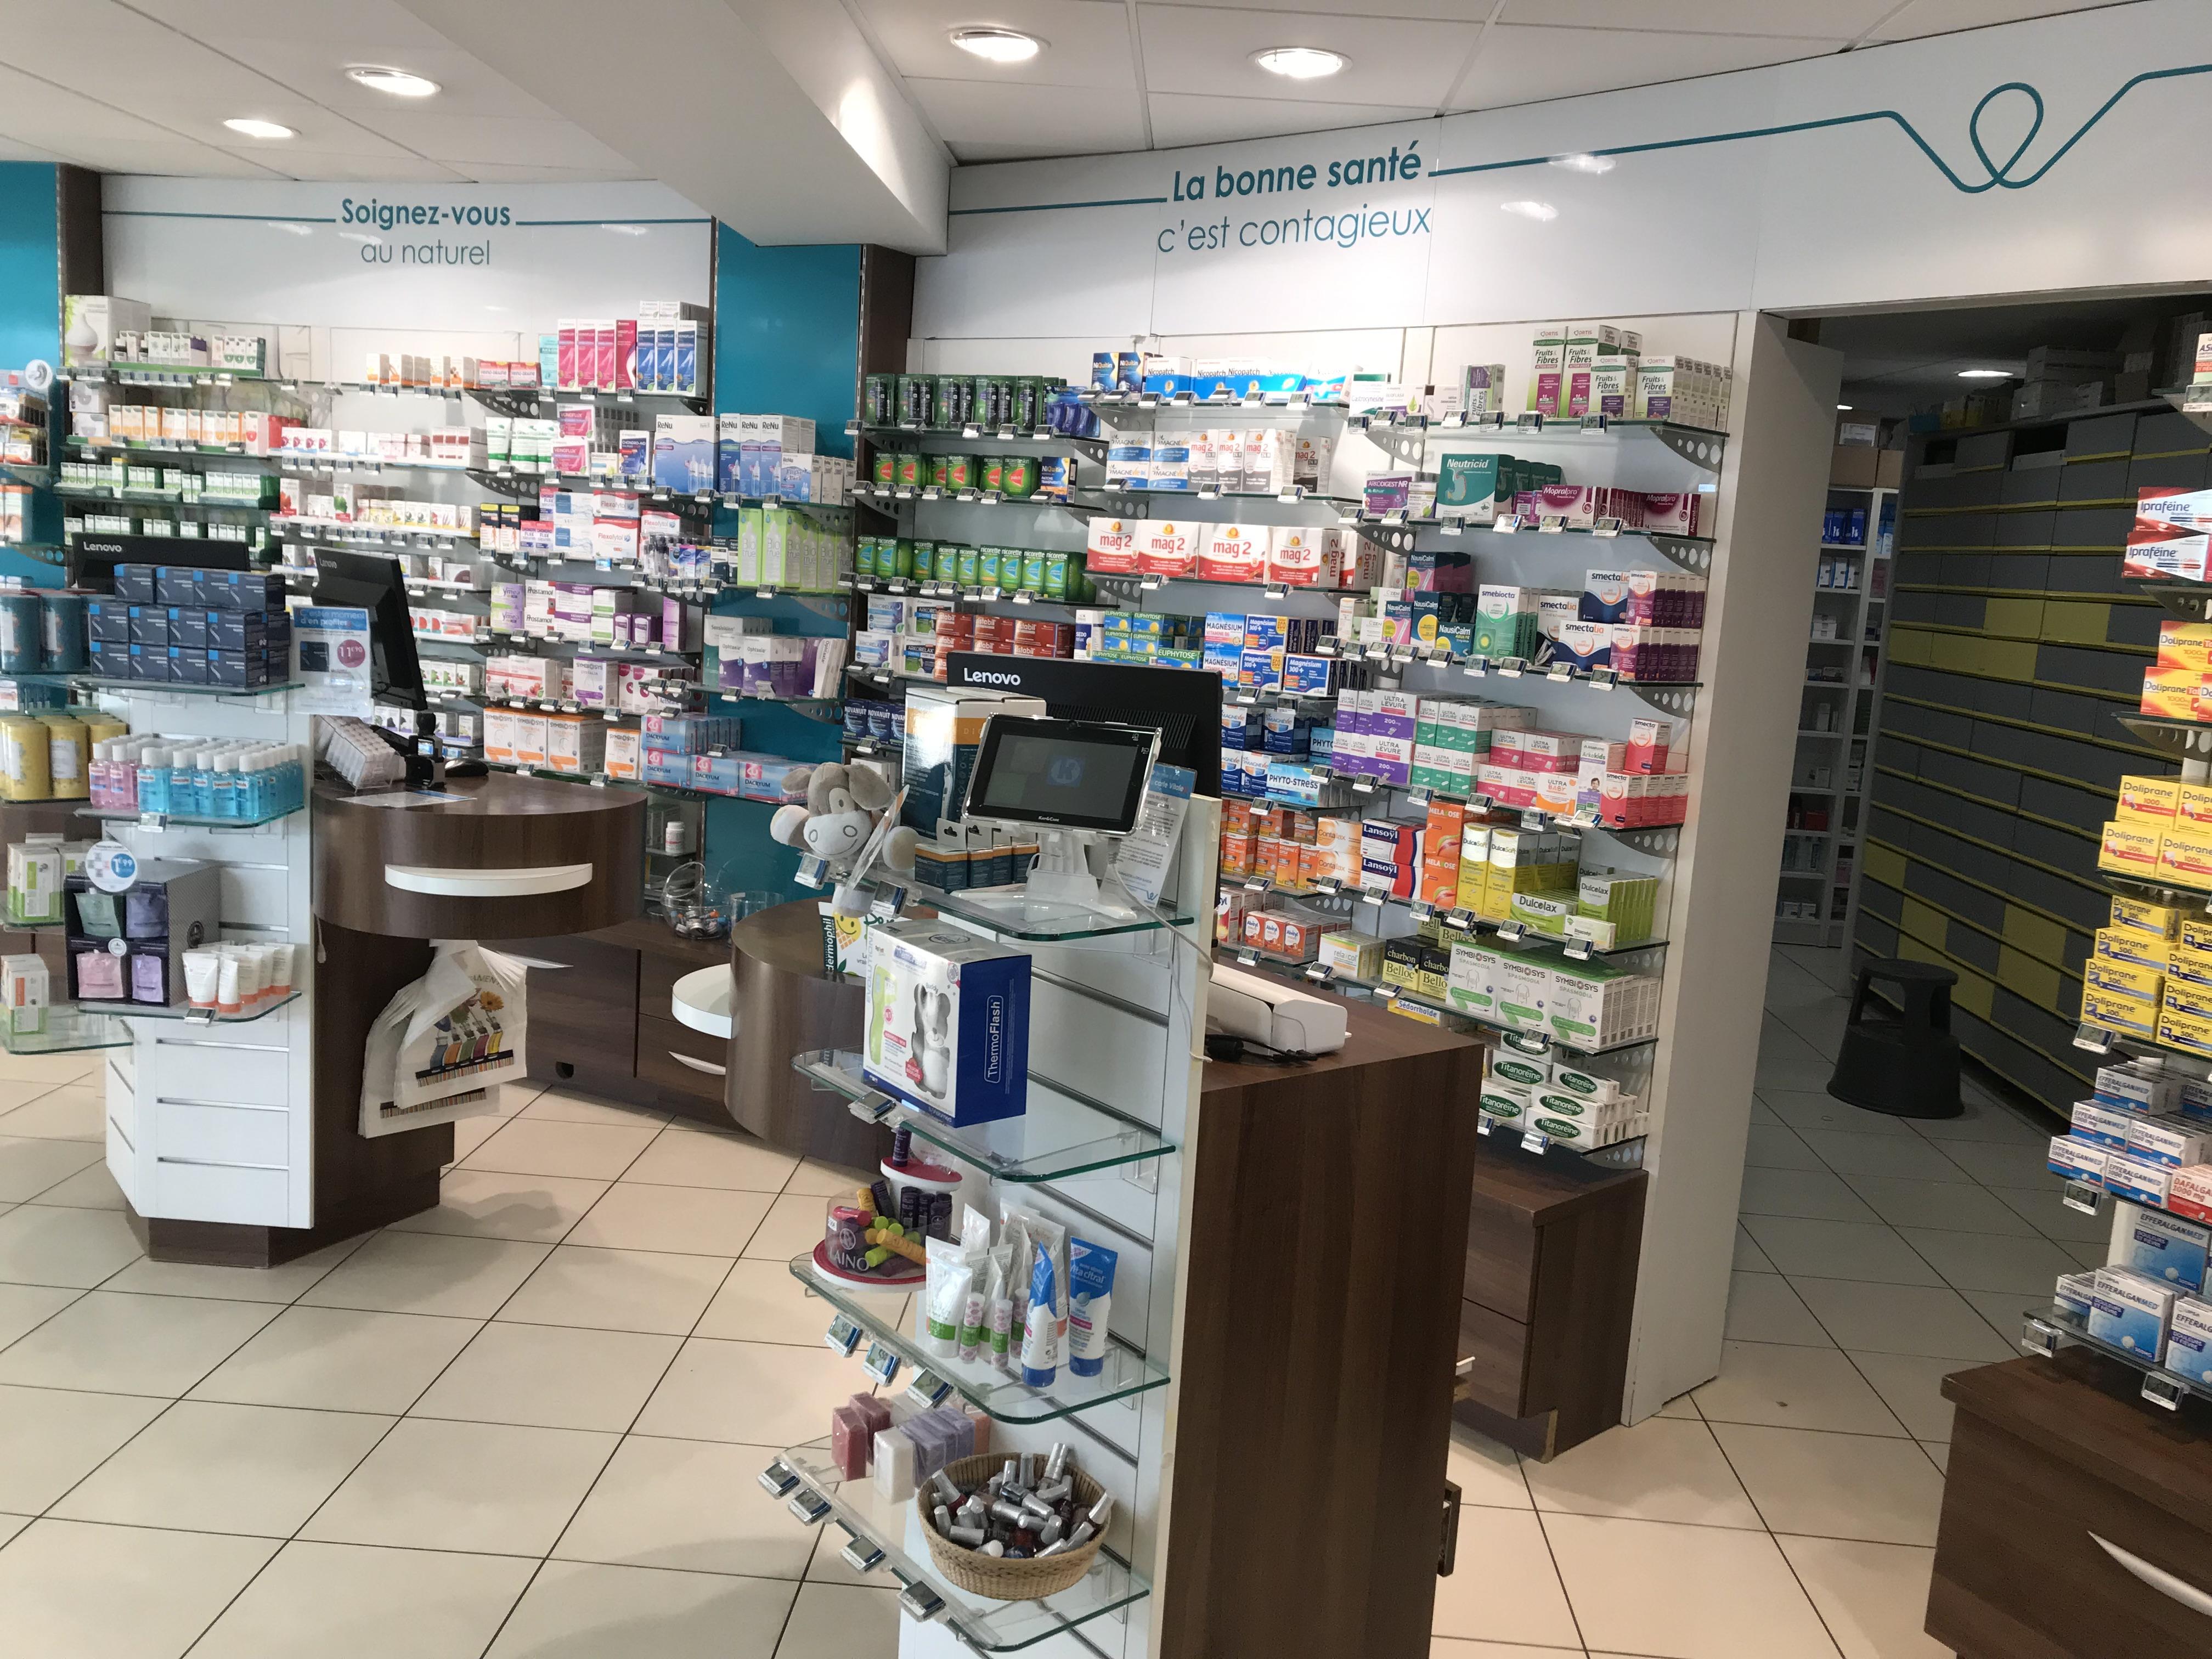 Pharmacie wellpharma | Pharmacie de la Croix Blanche